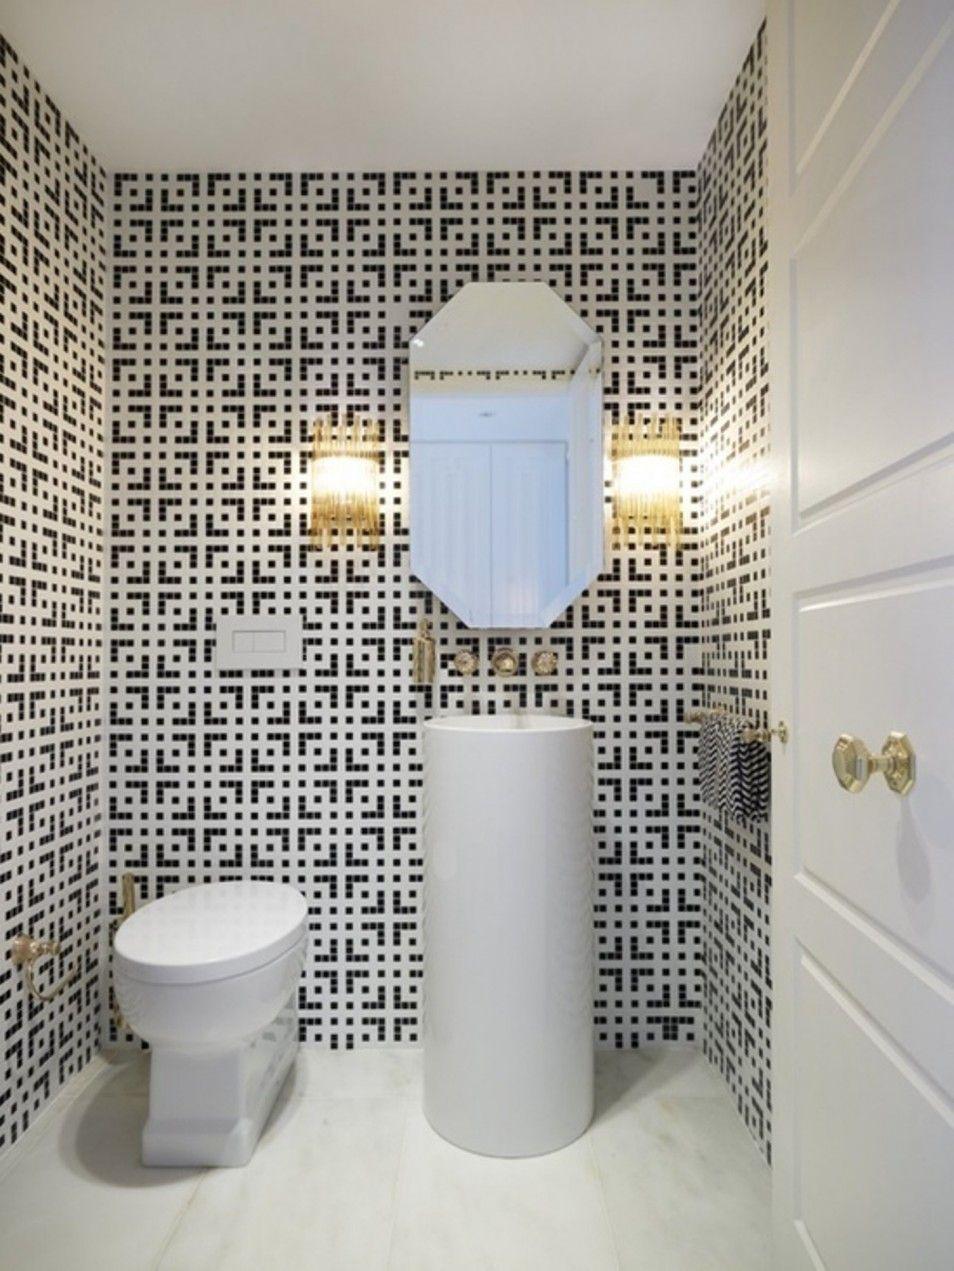 Bathroom Tile Patterns With A Simple Pattern Bathroom Floor Tile Best Minimalist Bathroom Shelf With Ceramic Tile Bathroom Tiling A Bathroom Floor How To Insta